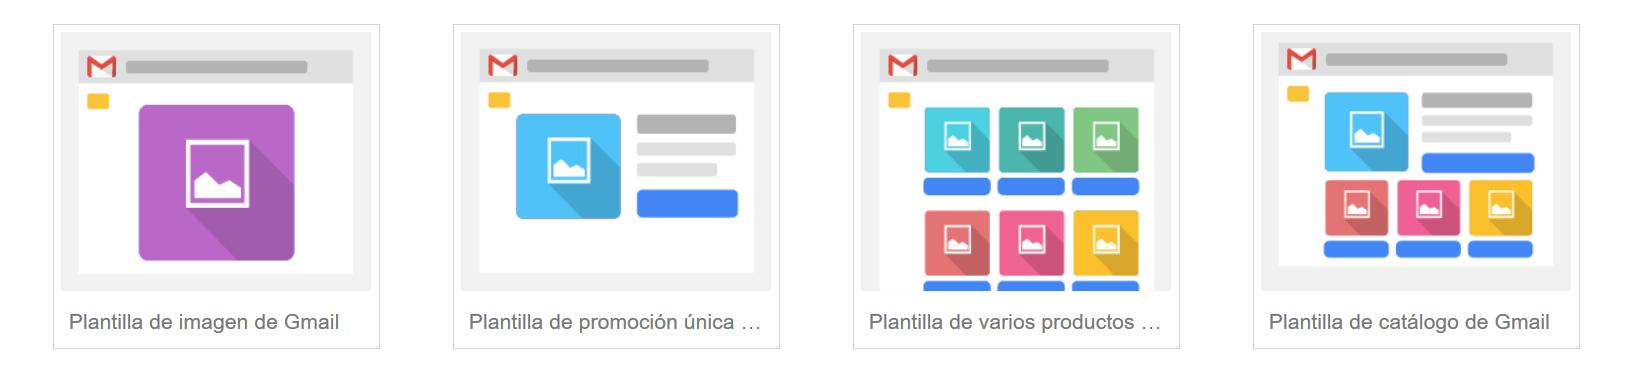 anuncios gmail